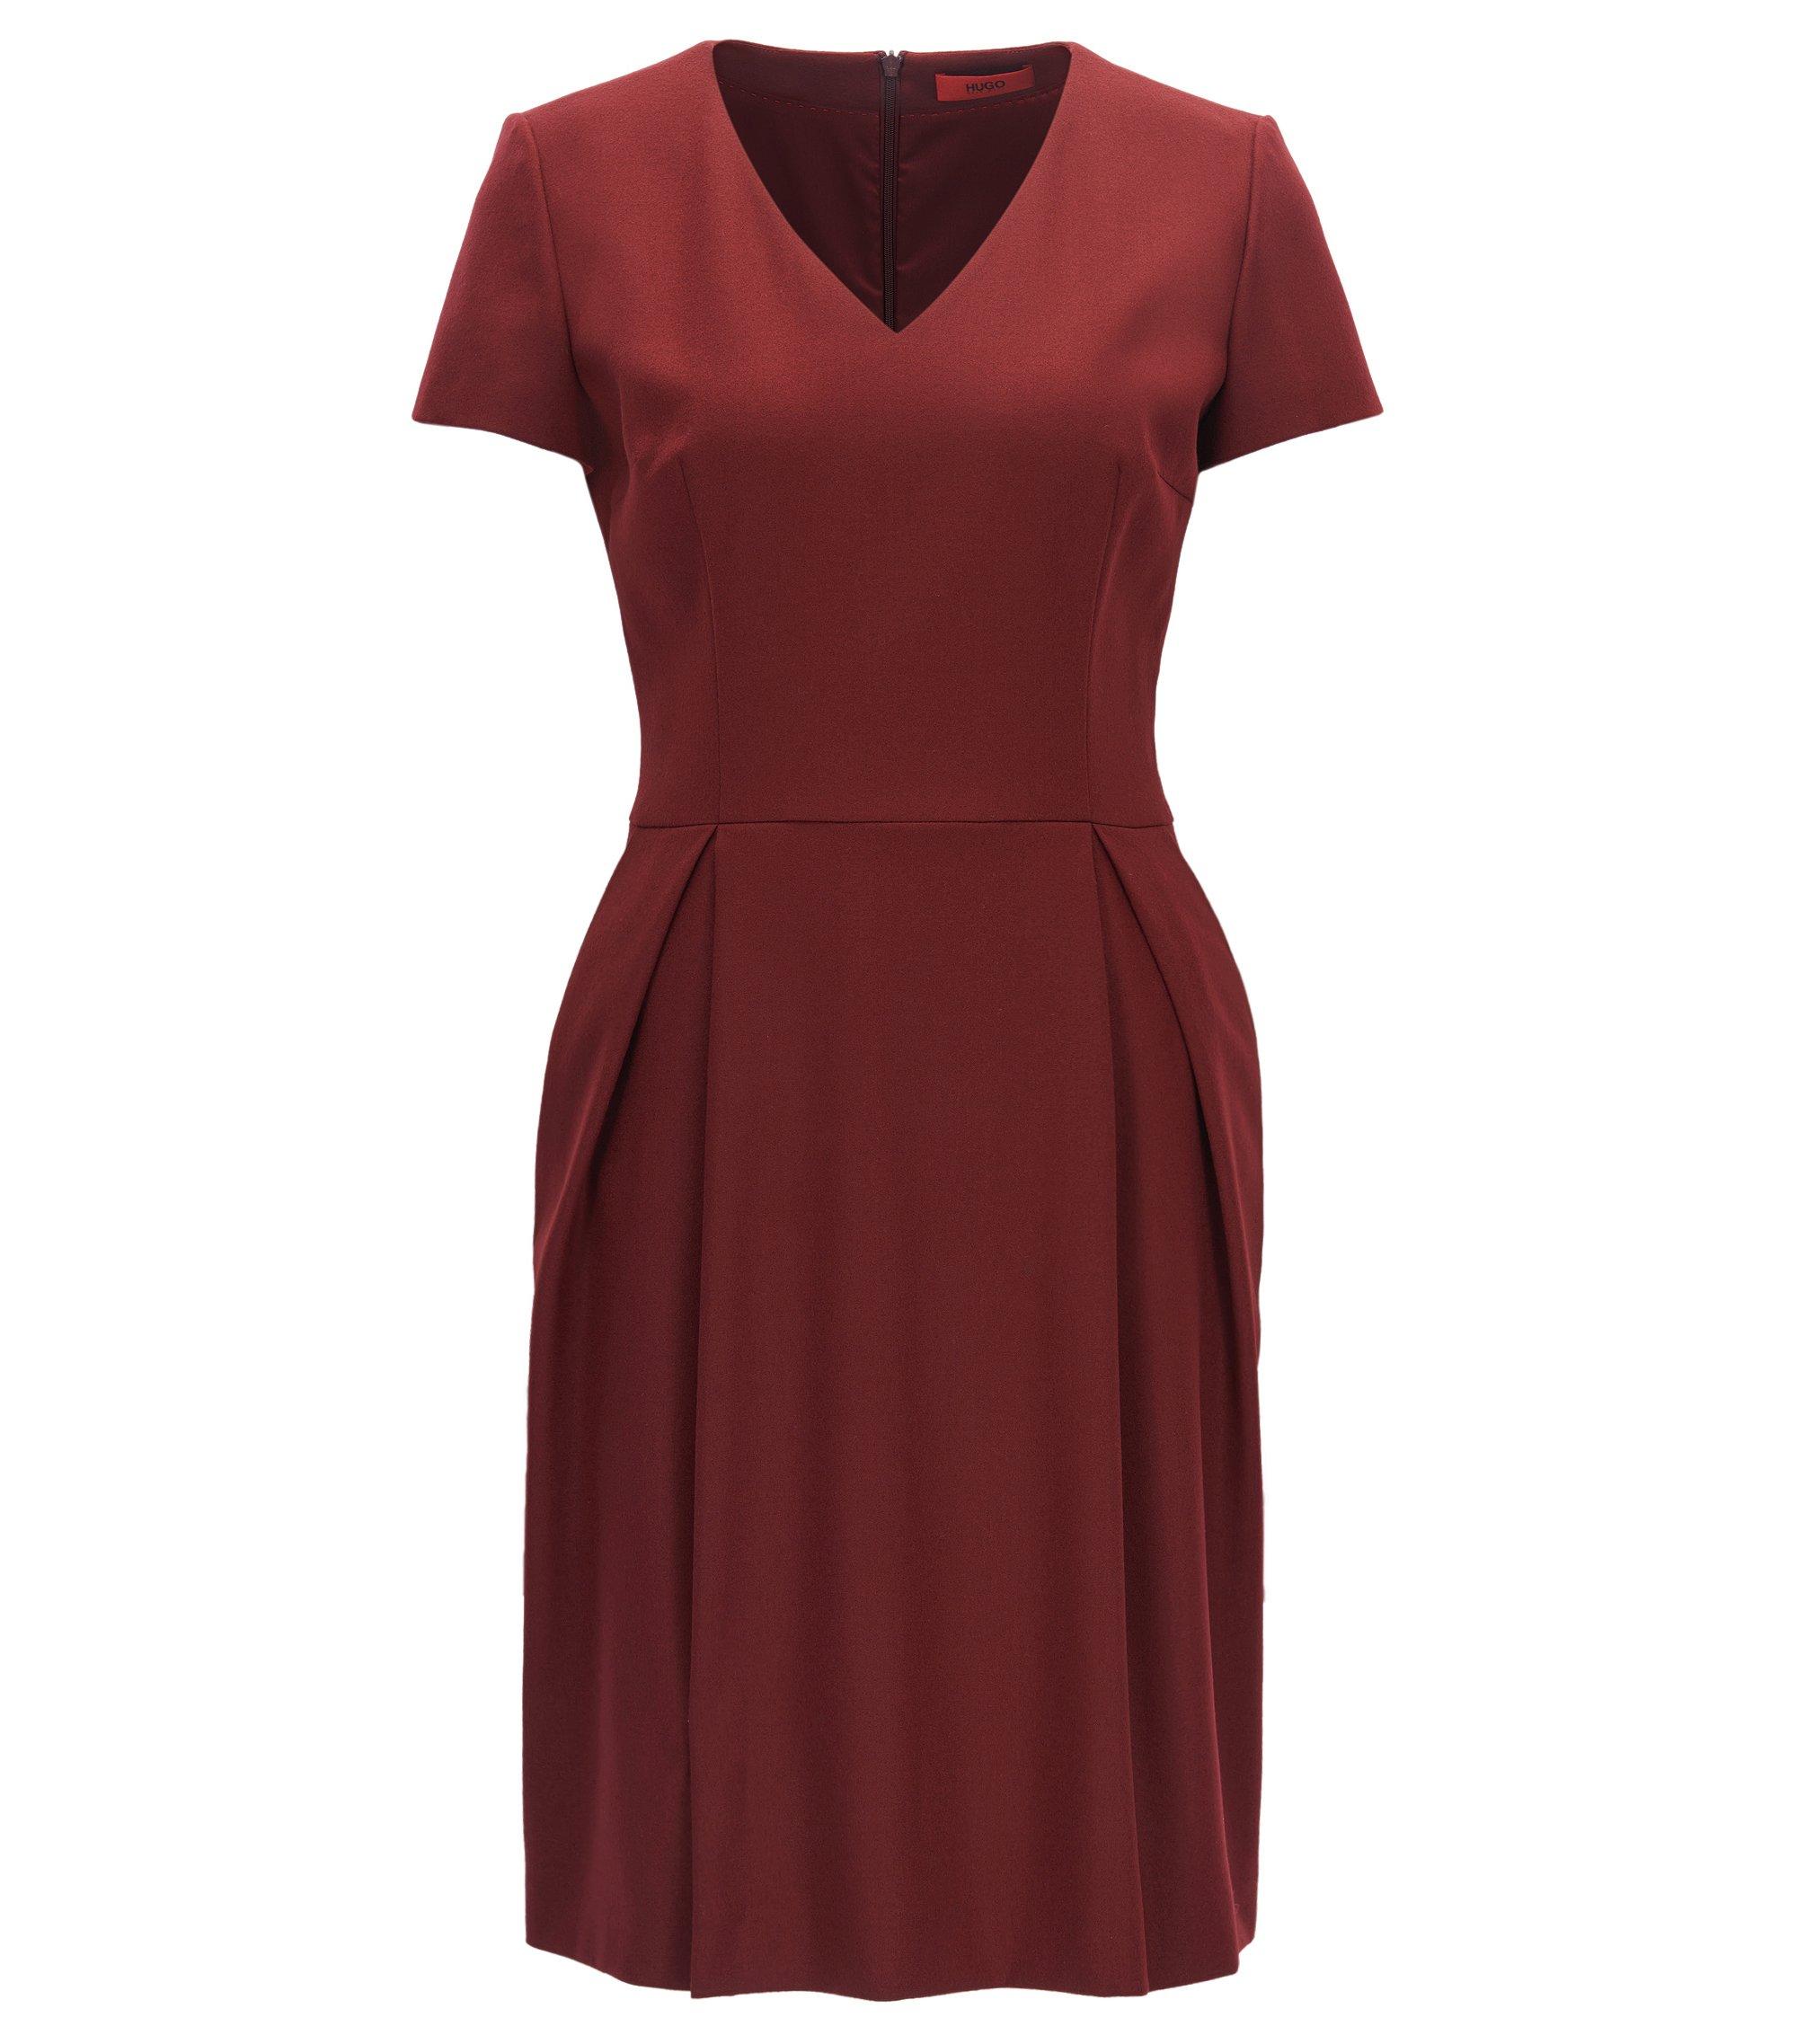 Robe colV en laine vierge stretch, Rouge sombre